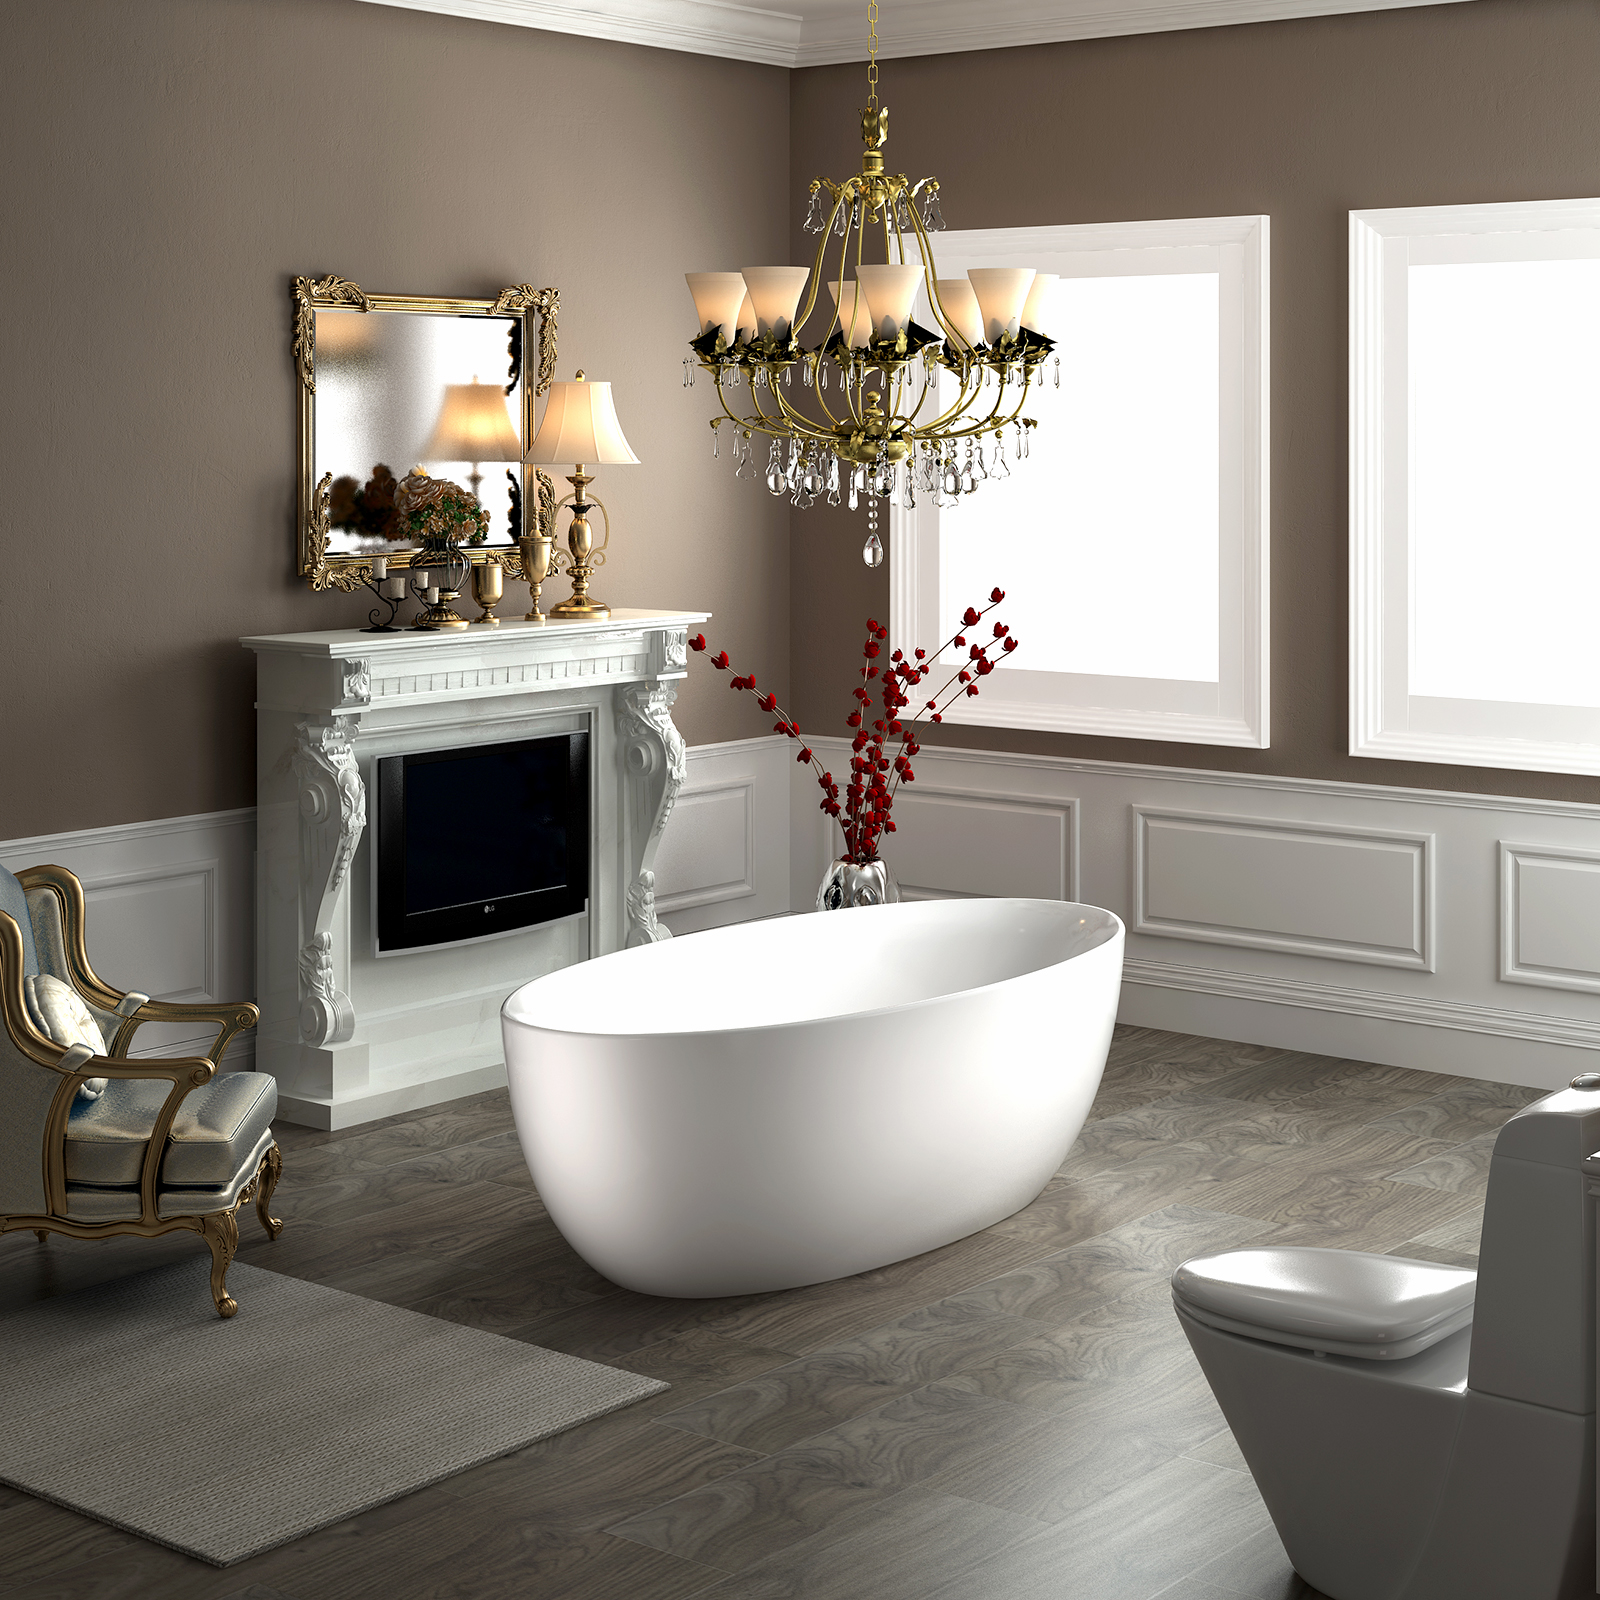 freistehende badewanne terra acryl wei matt 186 x 88 x. Black Bedroom Furniture Sets. Home Design Ideas